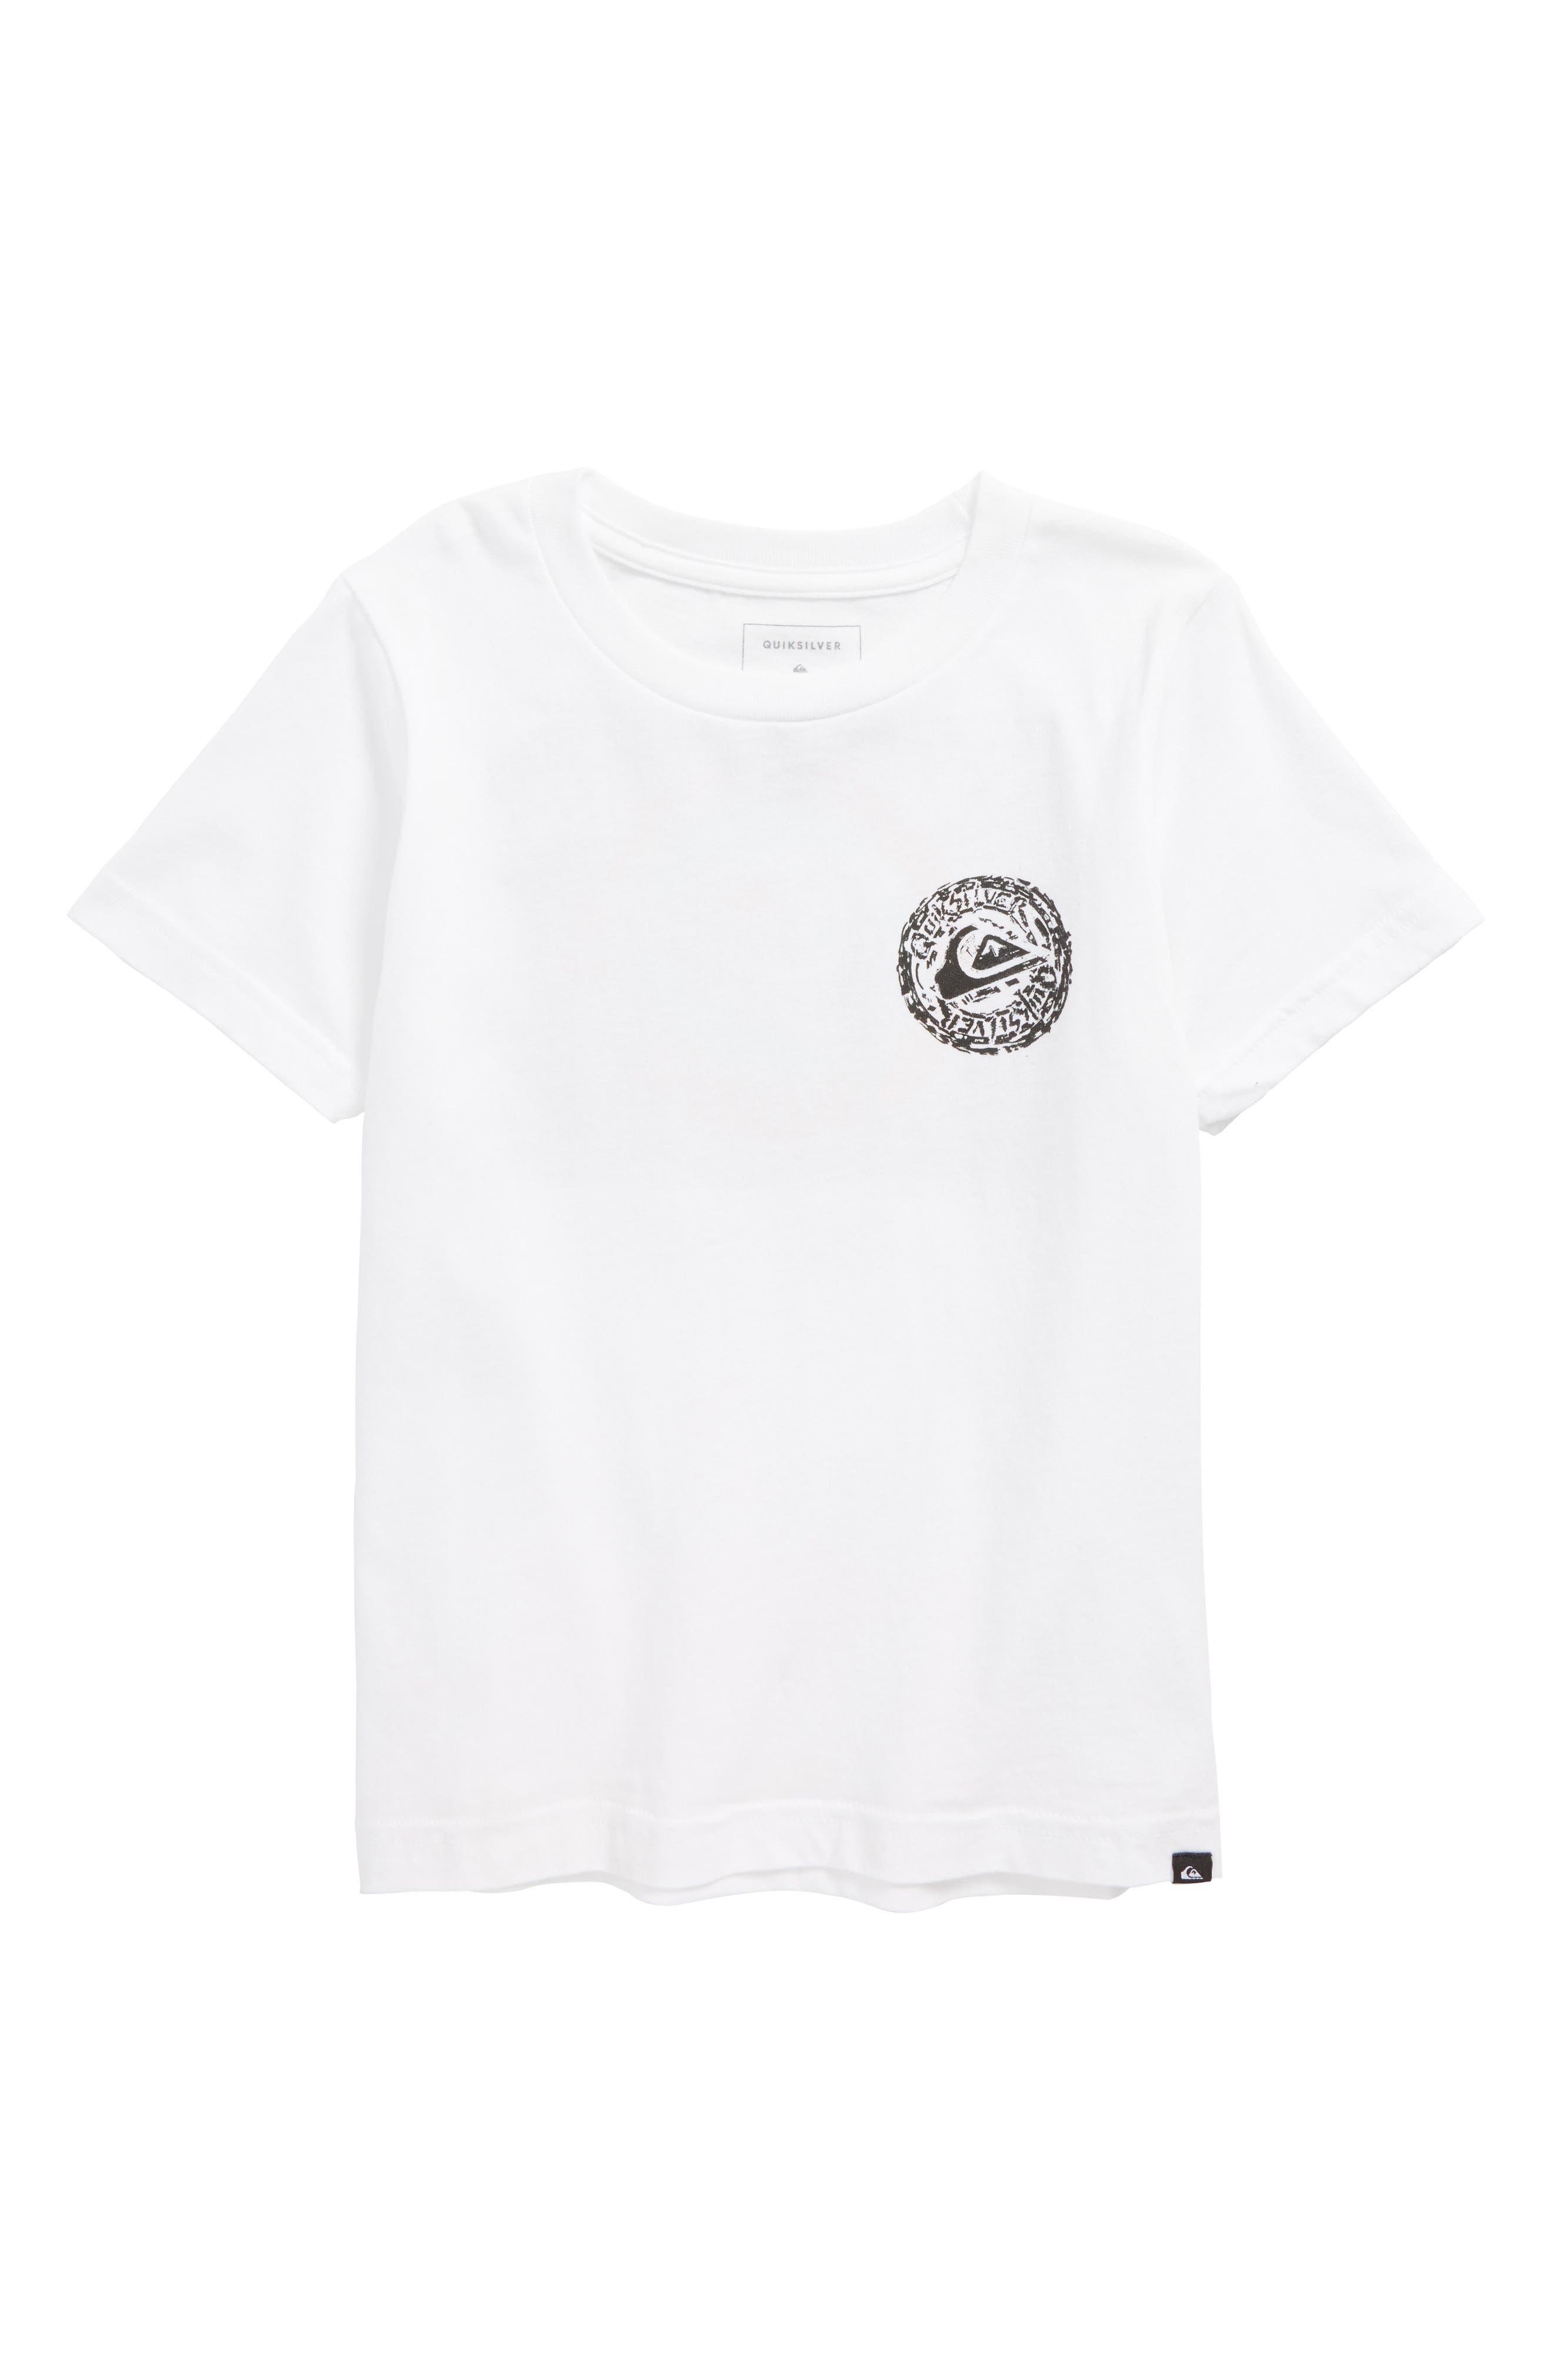 Elevens T-Shirt,                         Main,                         color, White